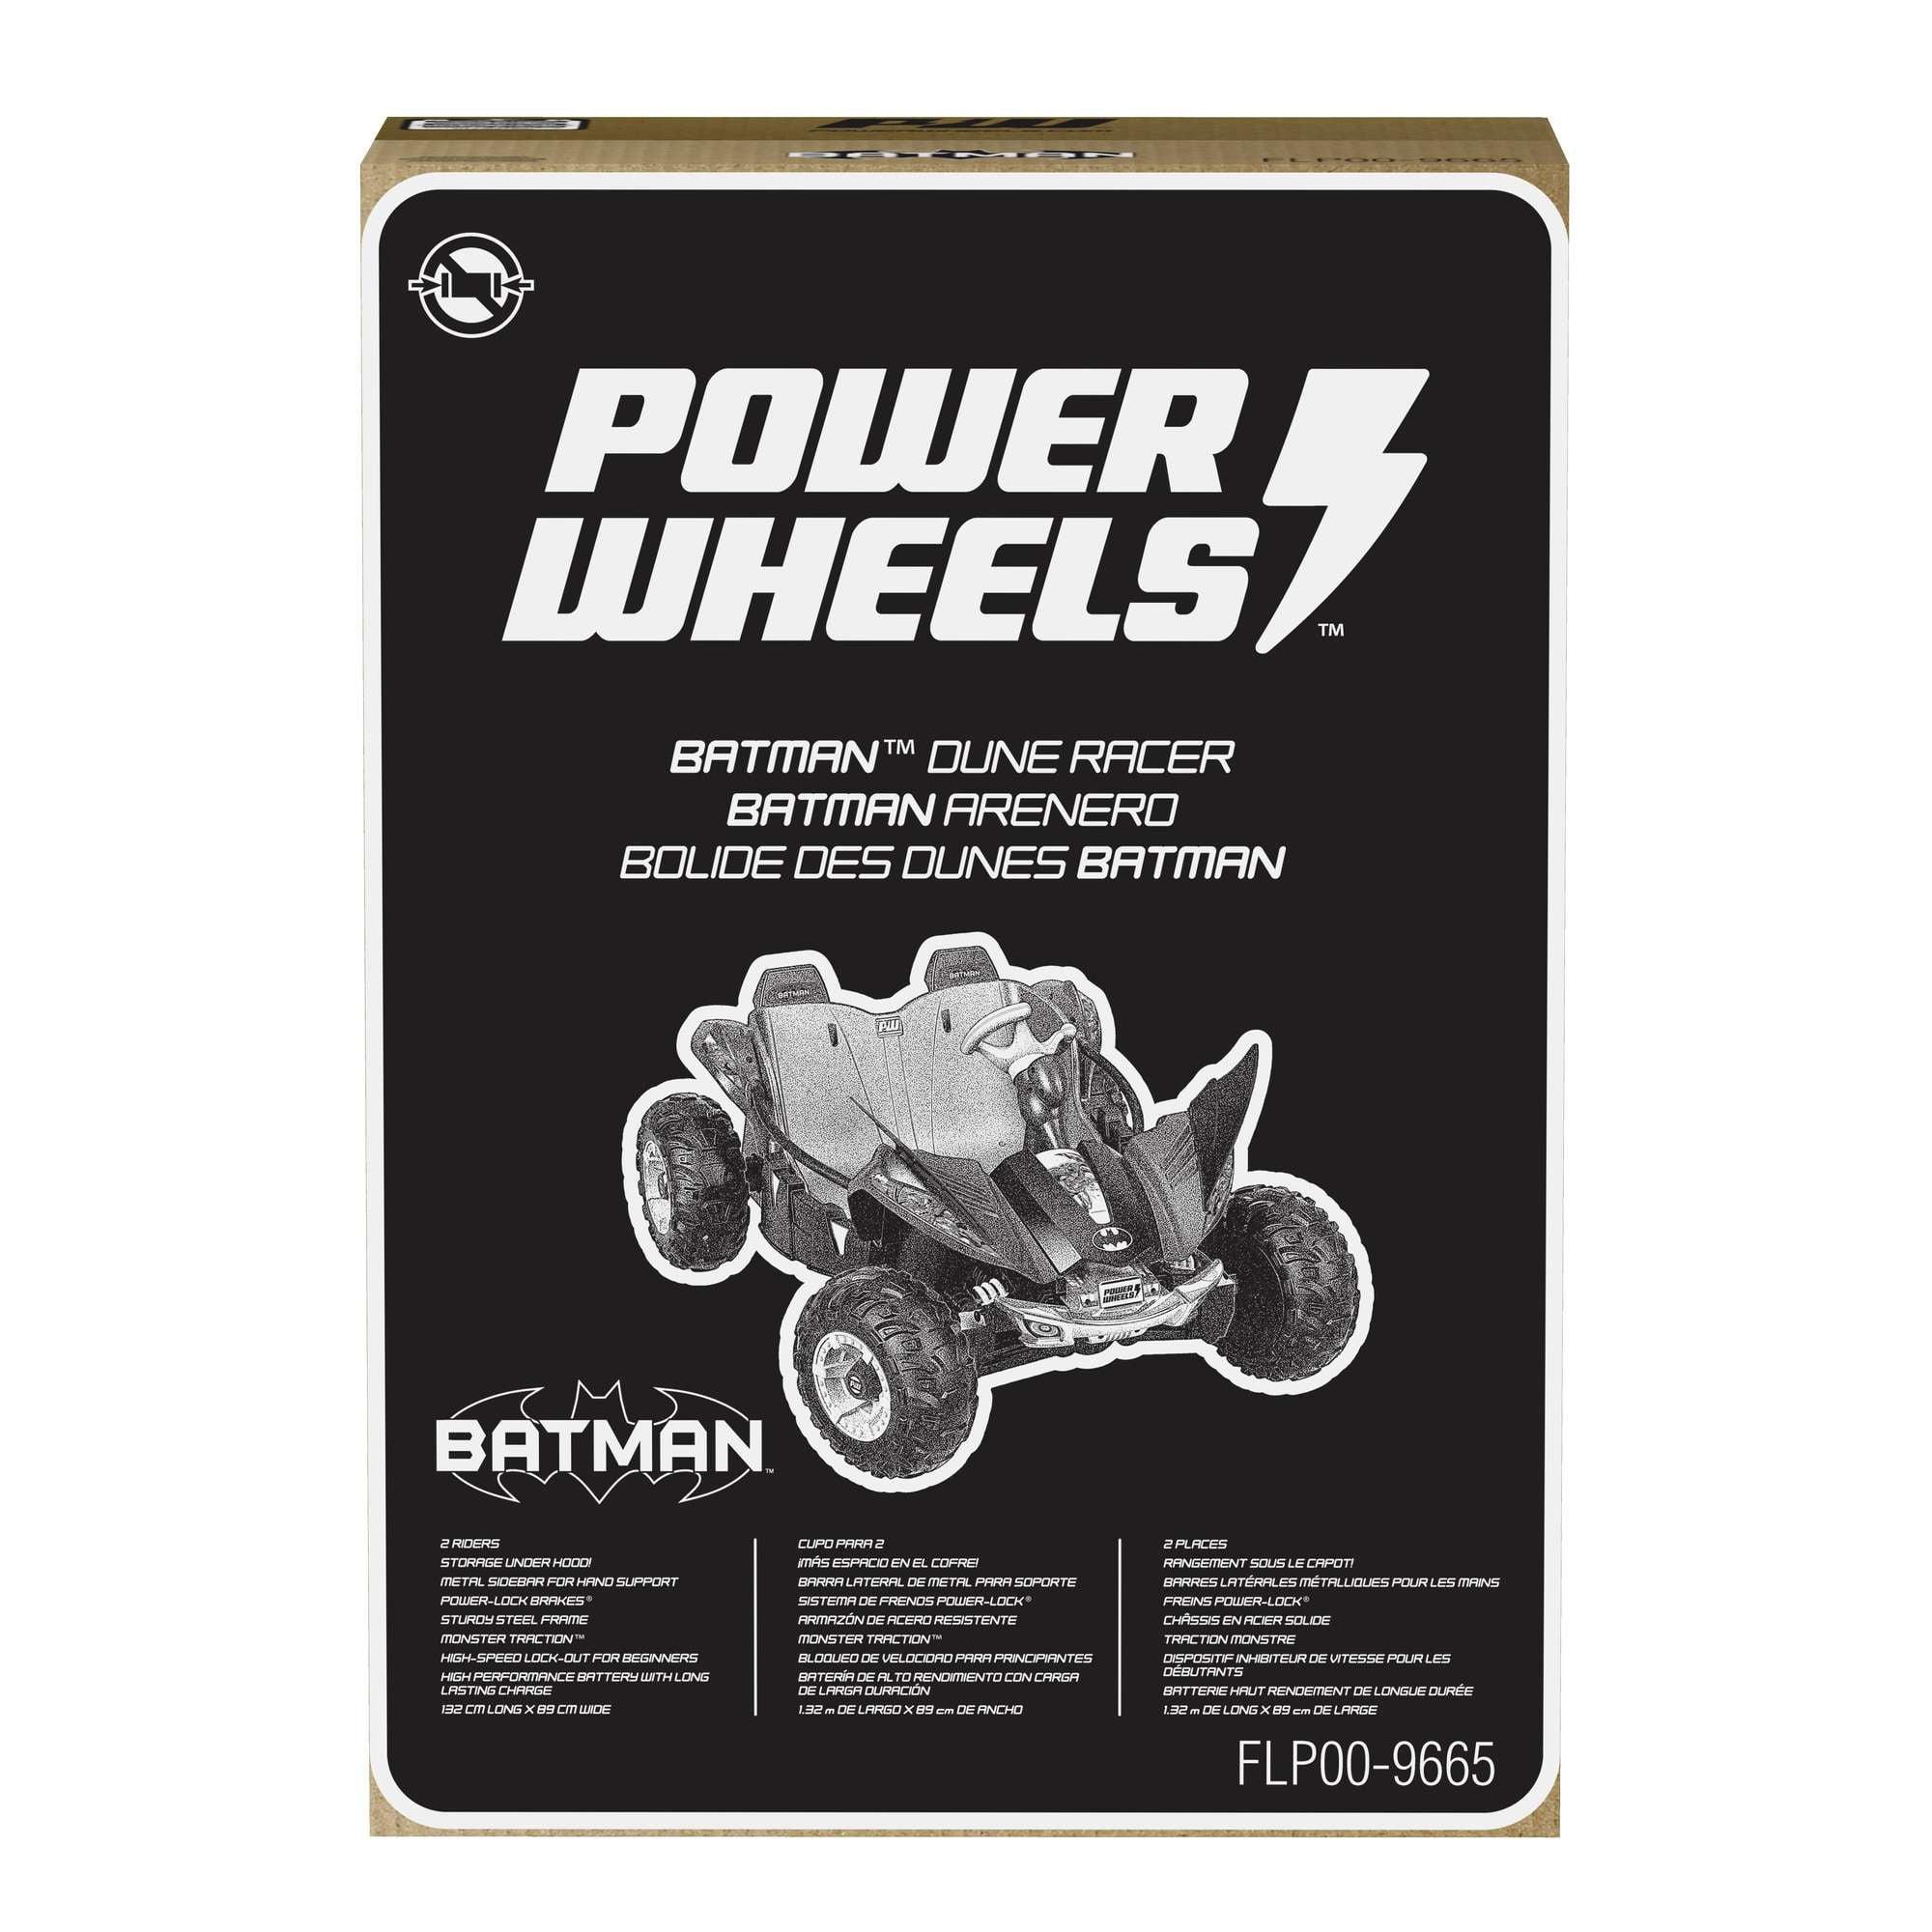 Power Wheels Batman Dune Racer Battery-Powered Ride-On Vehicle